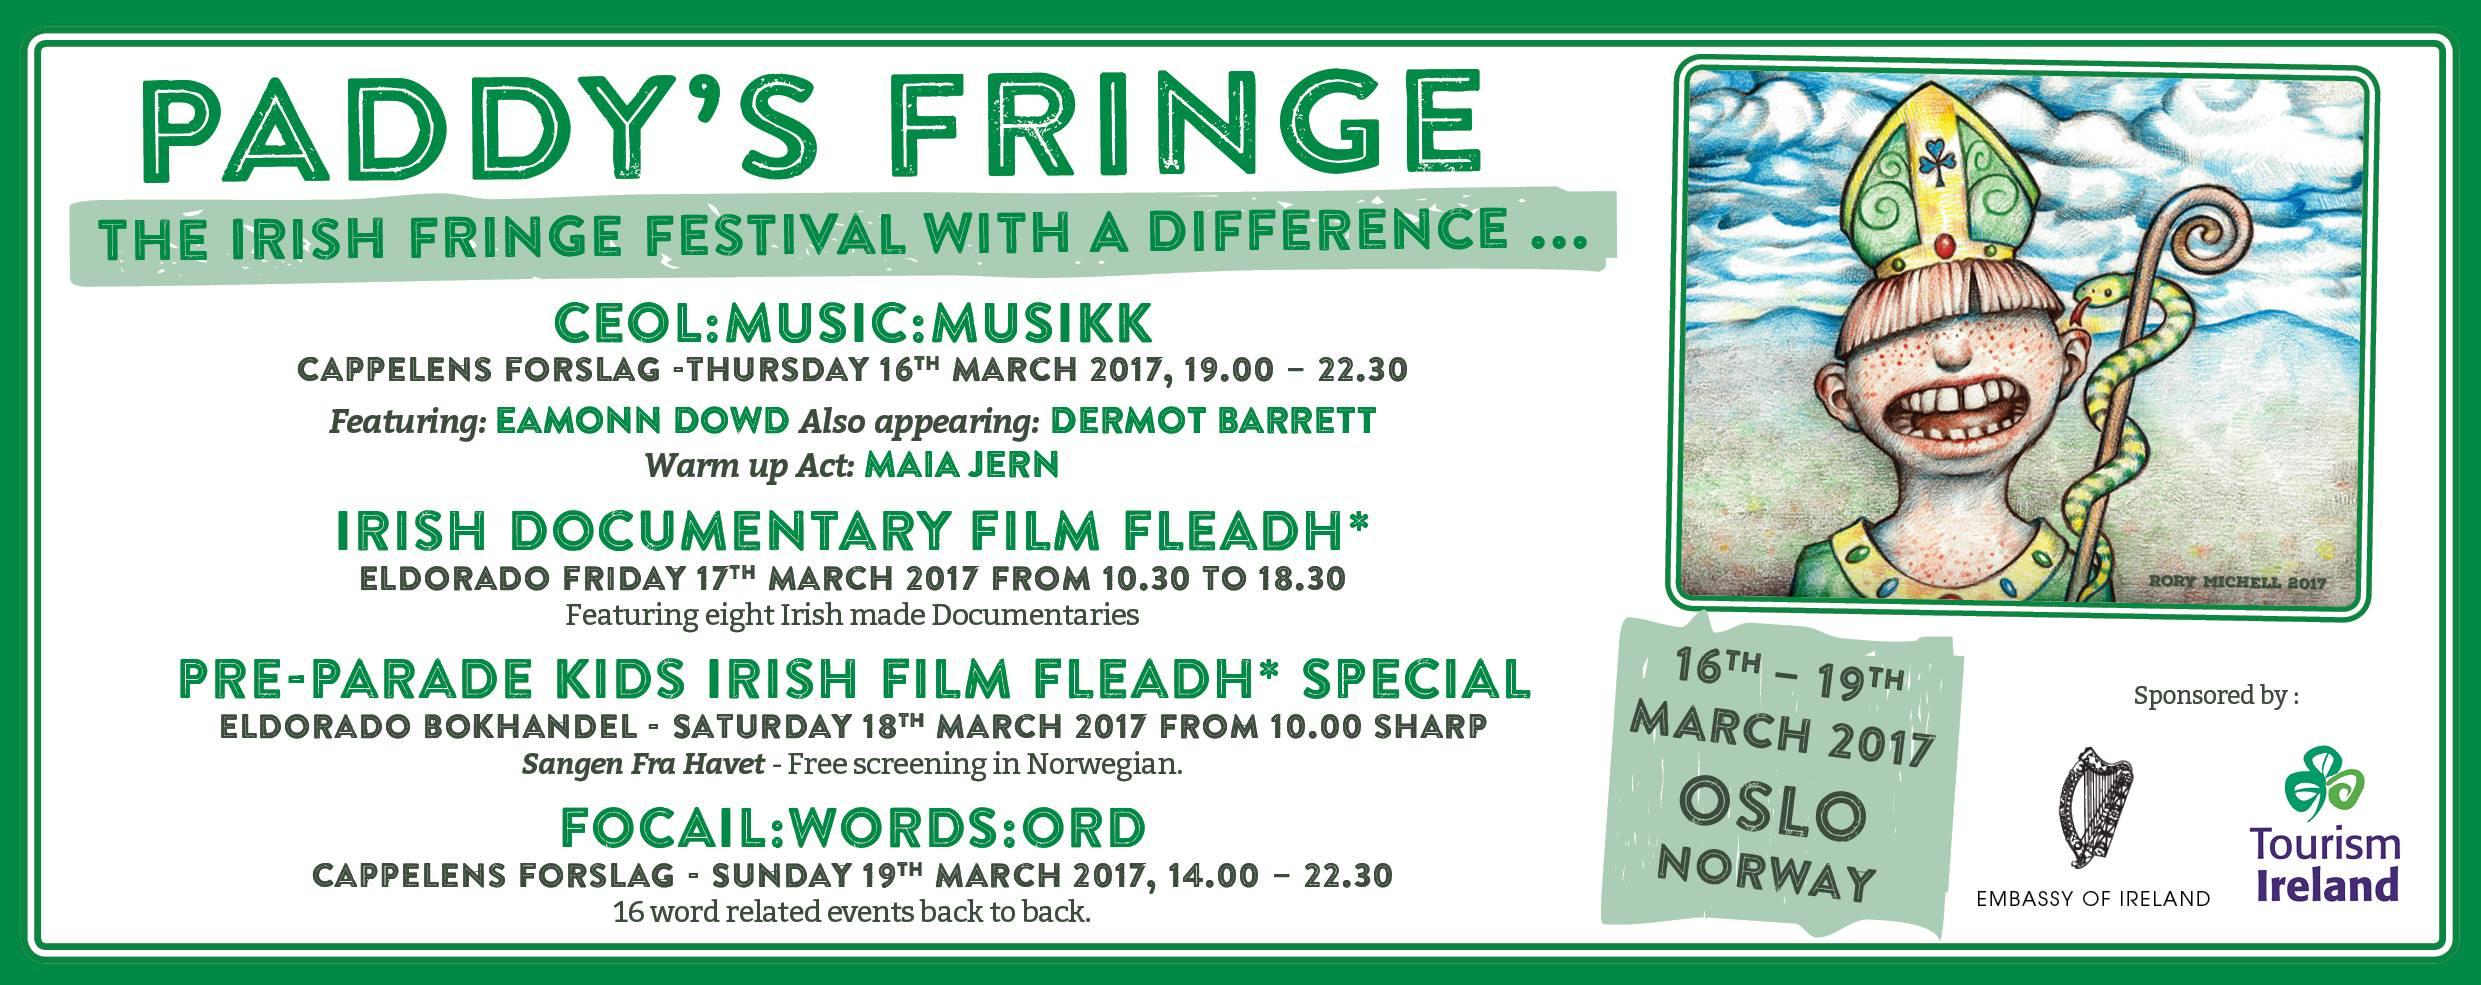 Paddy's Fringe Festival